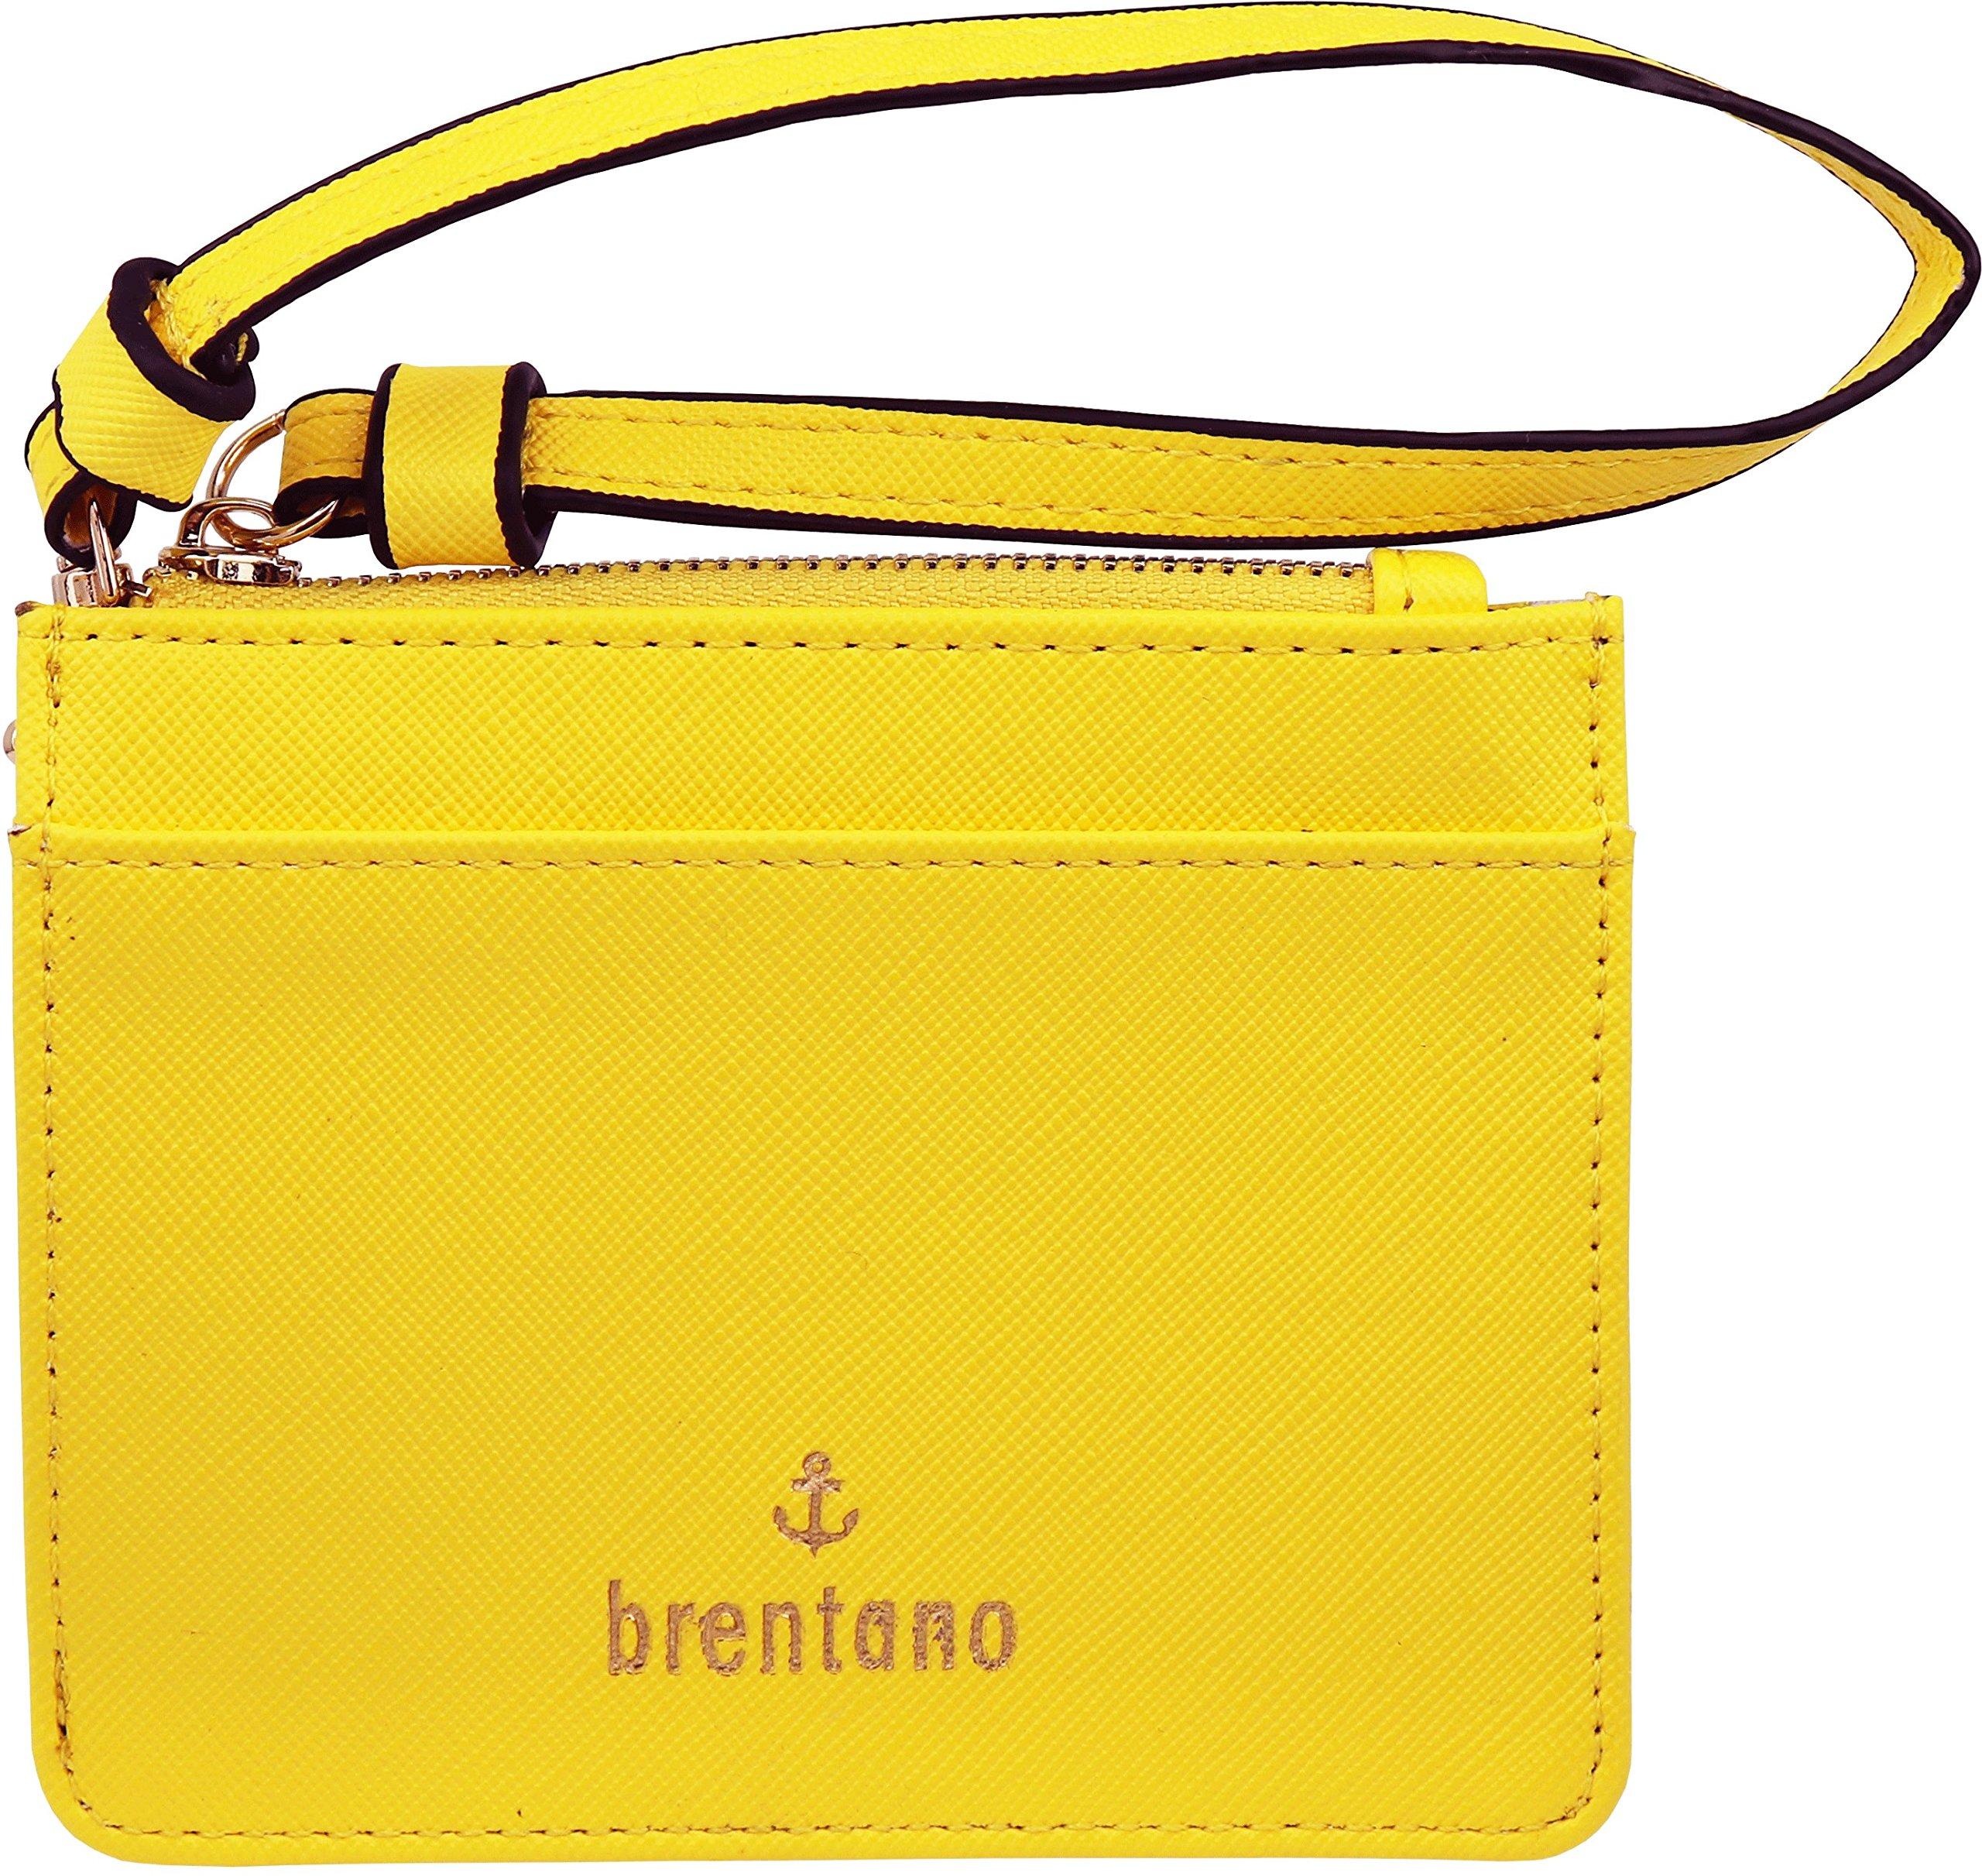 B BRENTANO Vegan Saffiano Leather Slim ID Credit Card Case with Wristlet Strap (Yellow)